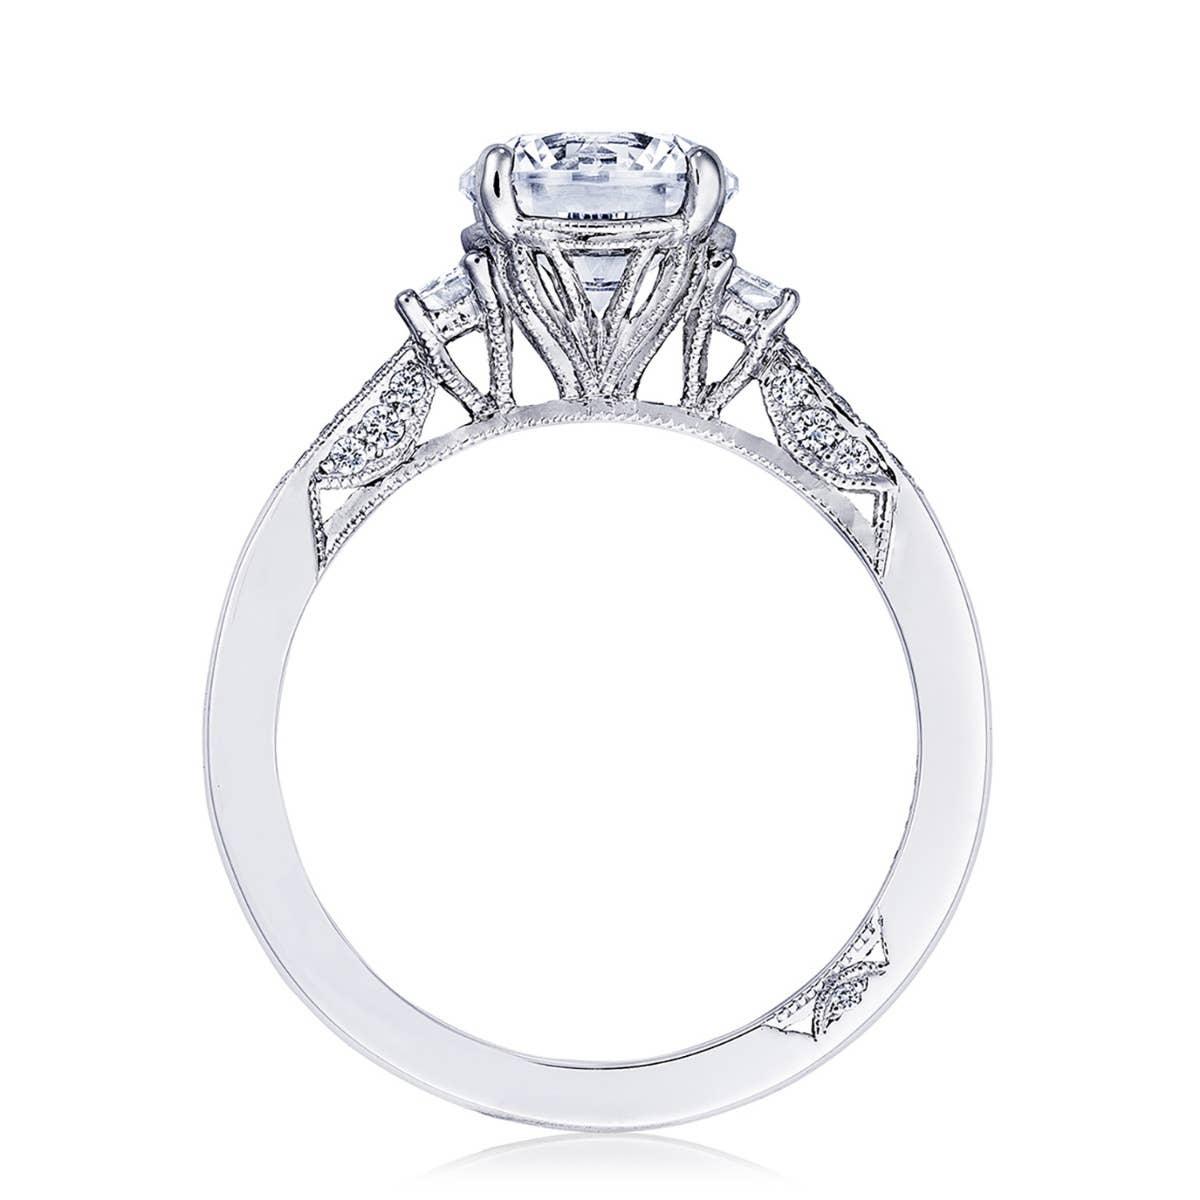 Tacori Engagement Rings - 2659rd